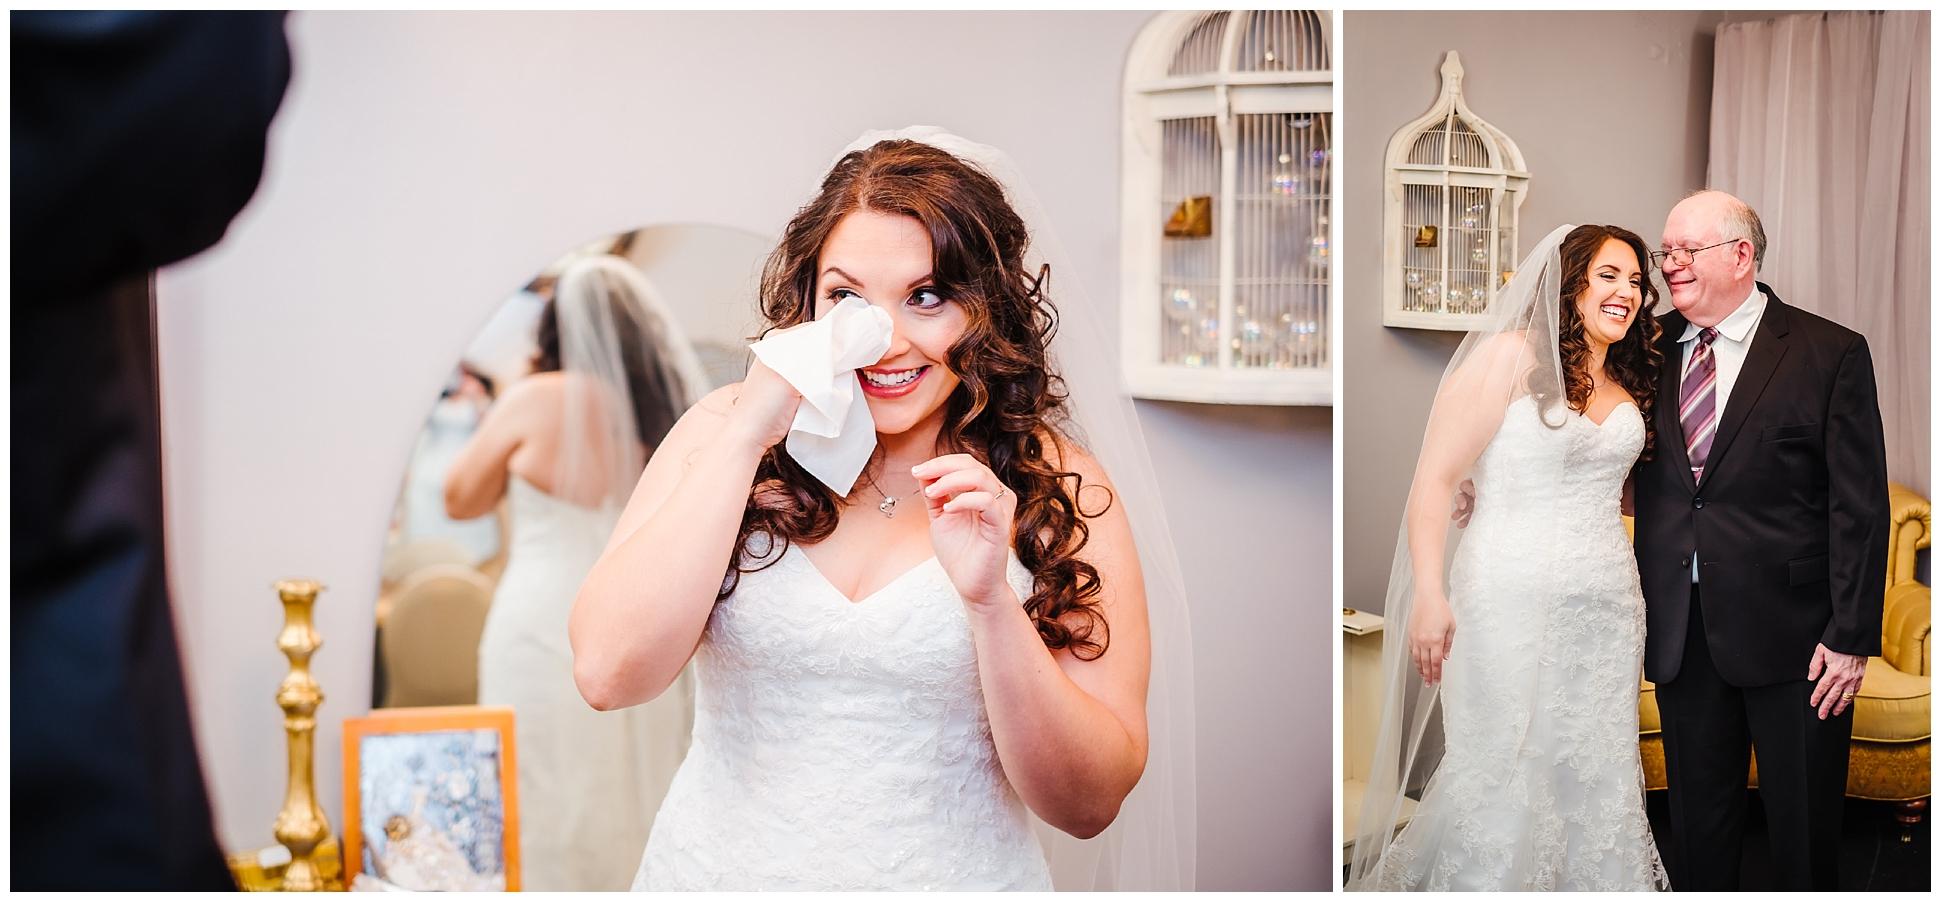 tampa-wedding-photographer-unique-indoor-venue_0013.jpg